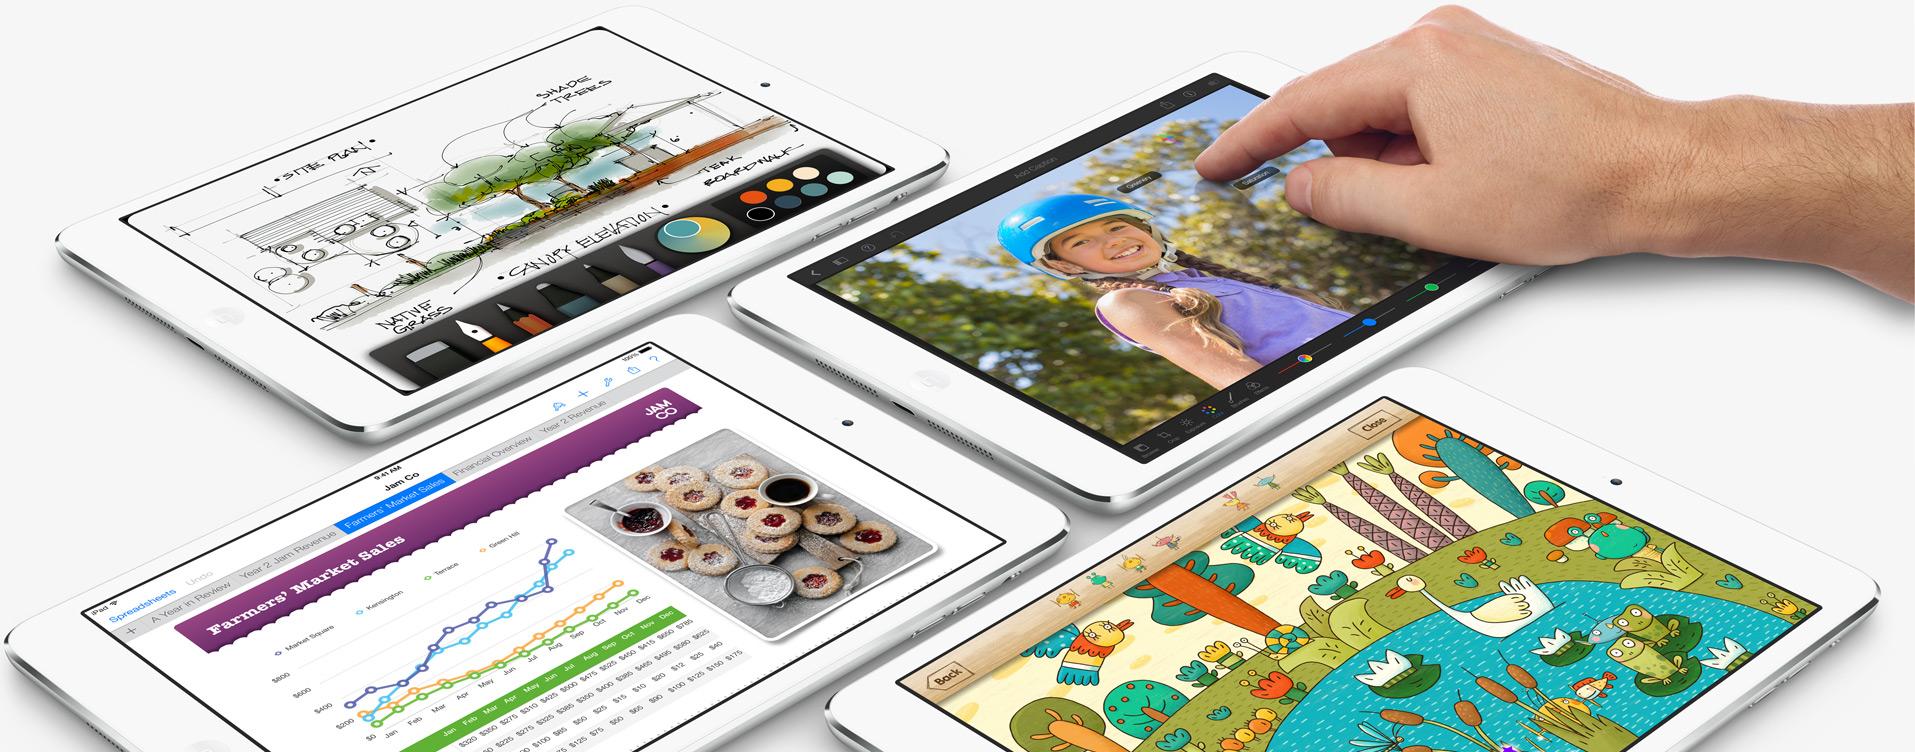 ipad mini 2 (Foto: Divulgação/Apple)